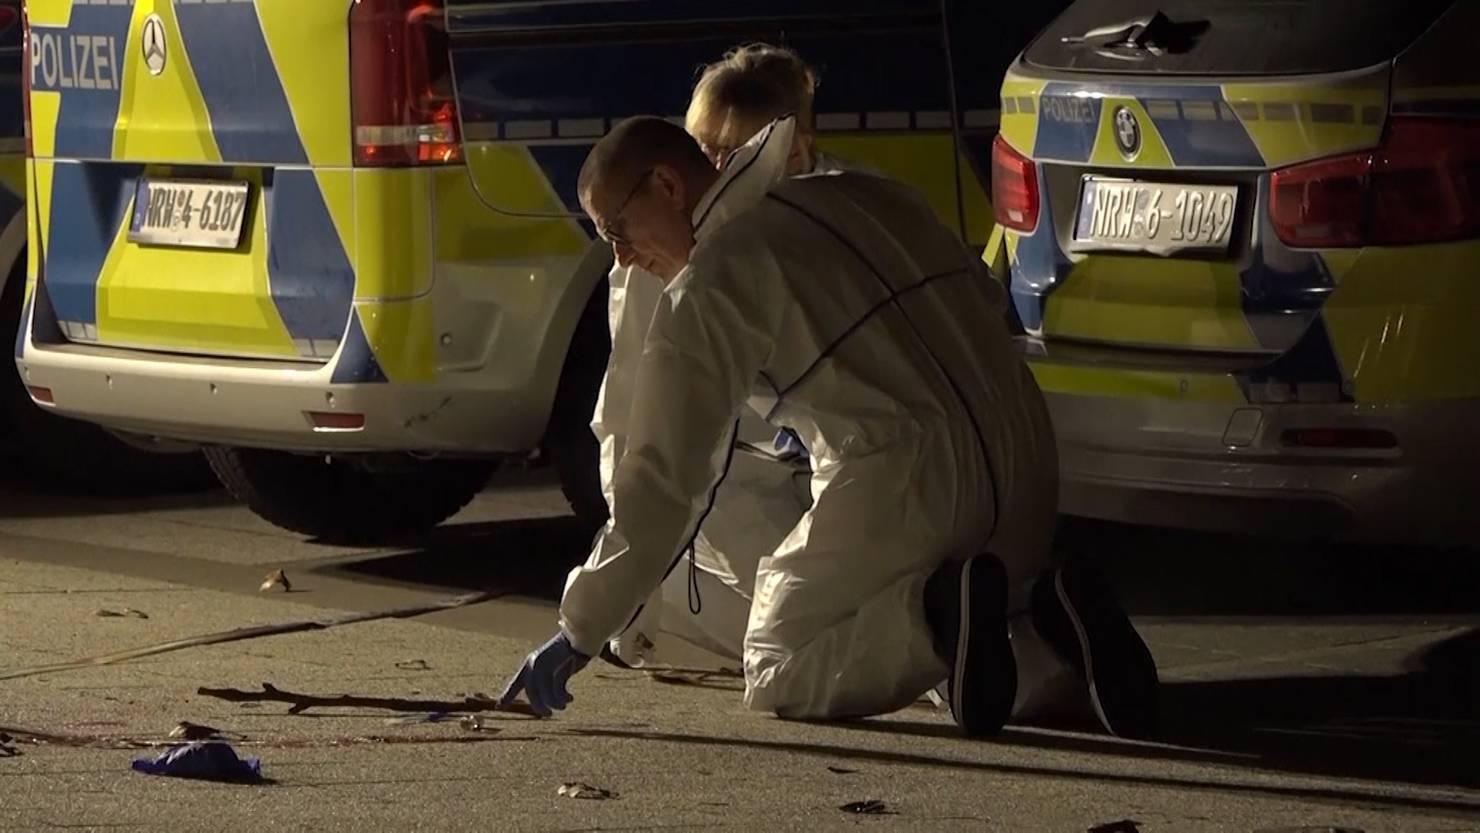 Polizist Erschießt Mann